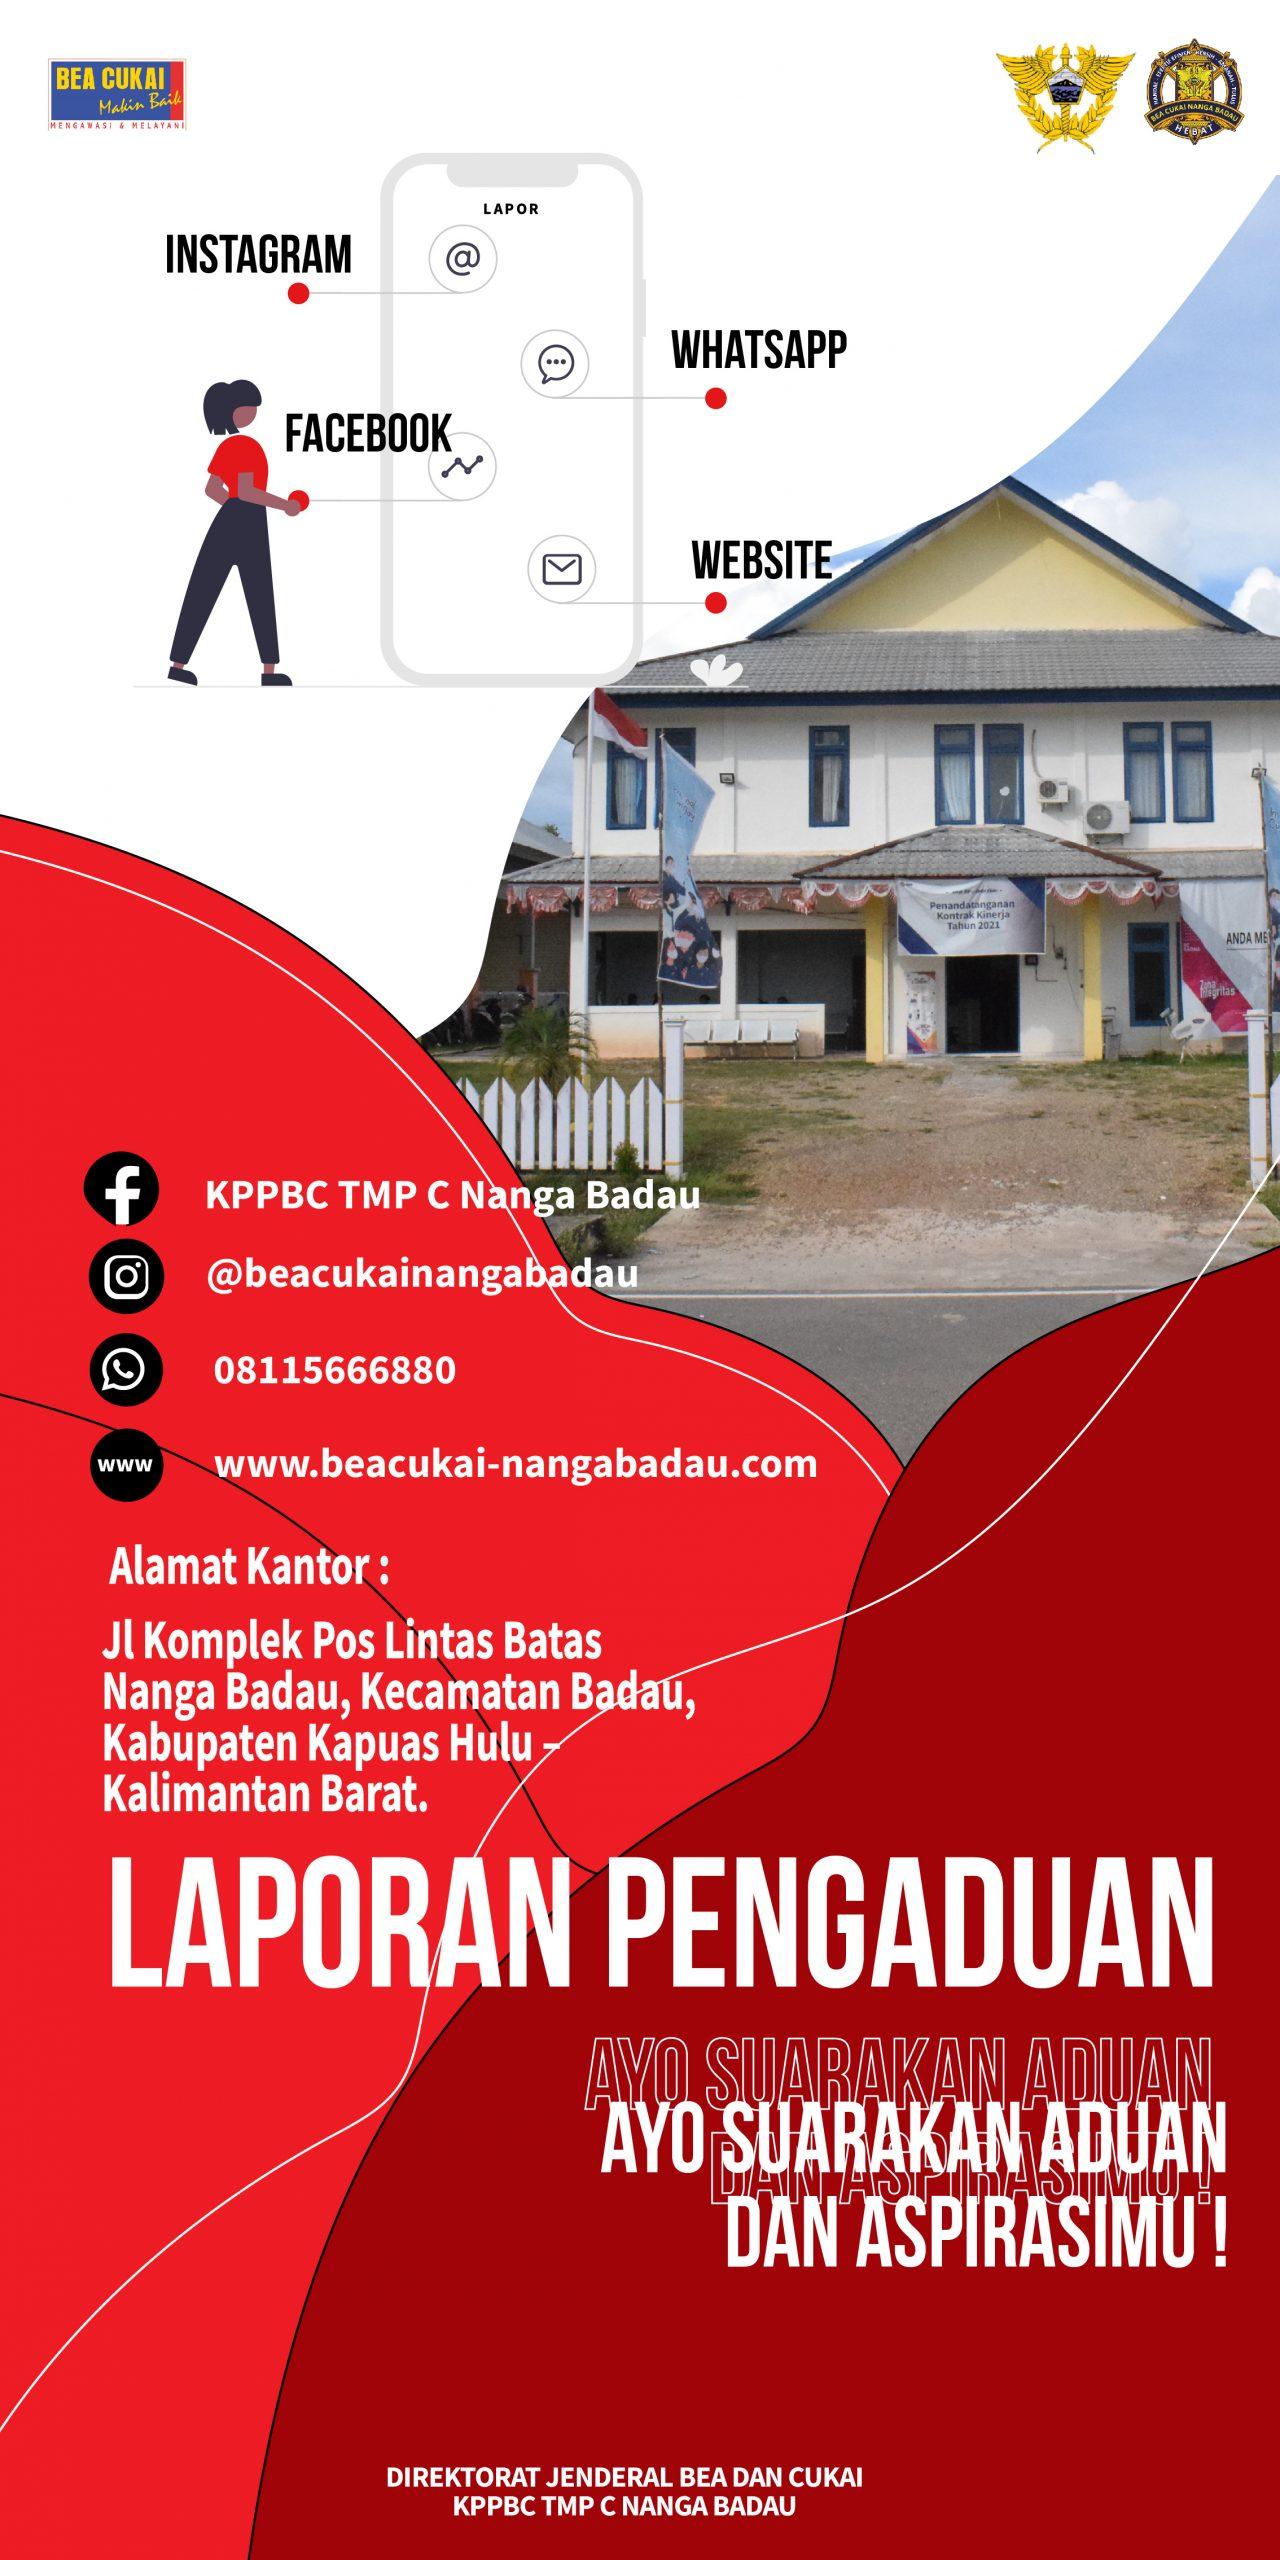 Kantor Pengawasan dan Pelayanan Bea dan Cukai Tipe Madya Pabean C Nanga Badau